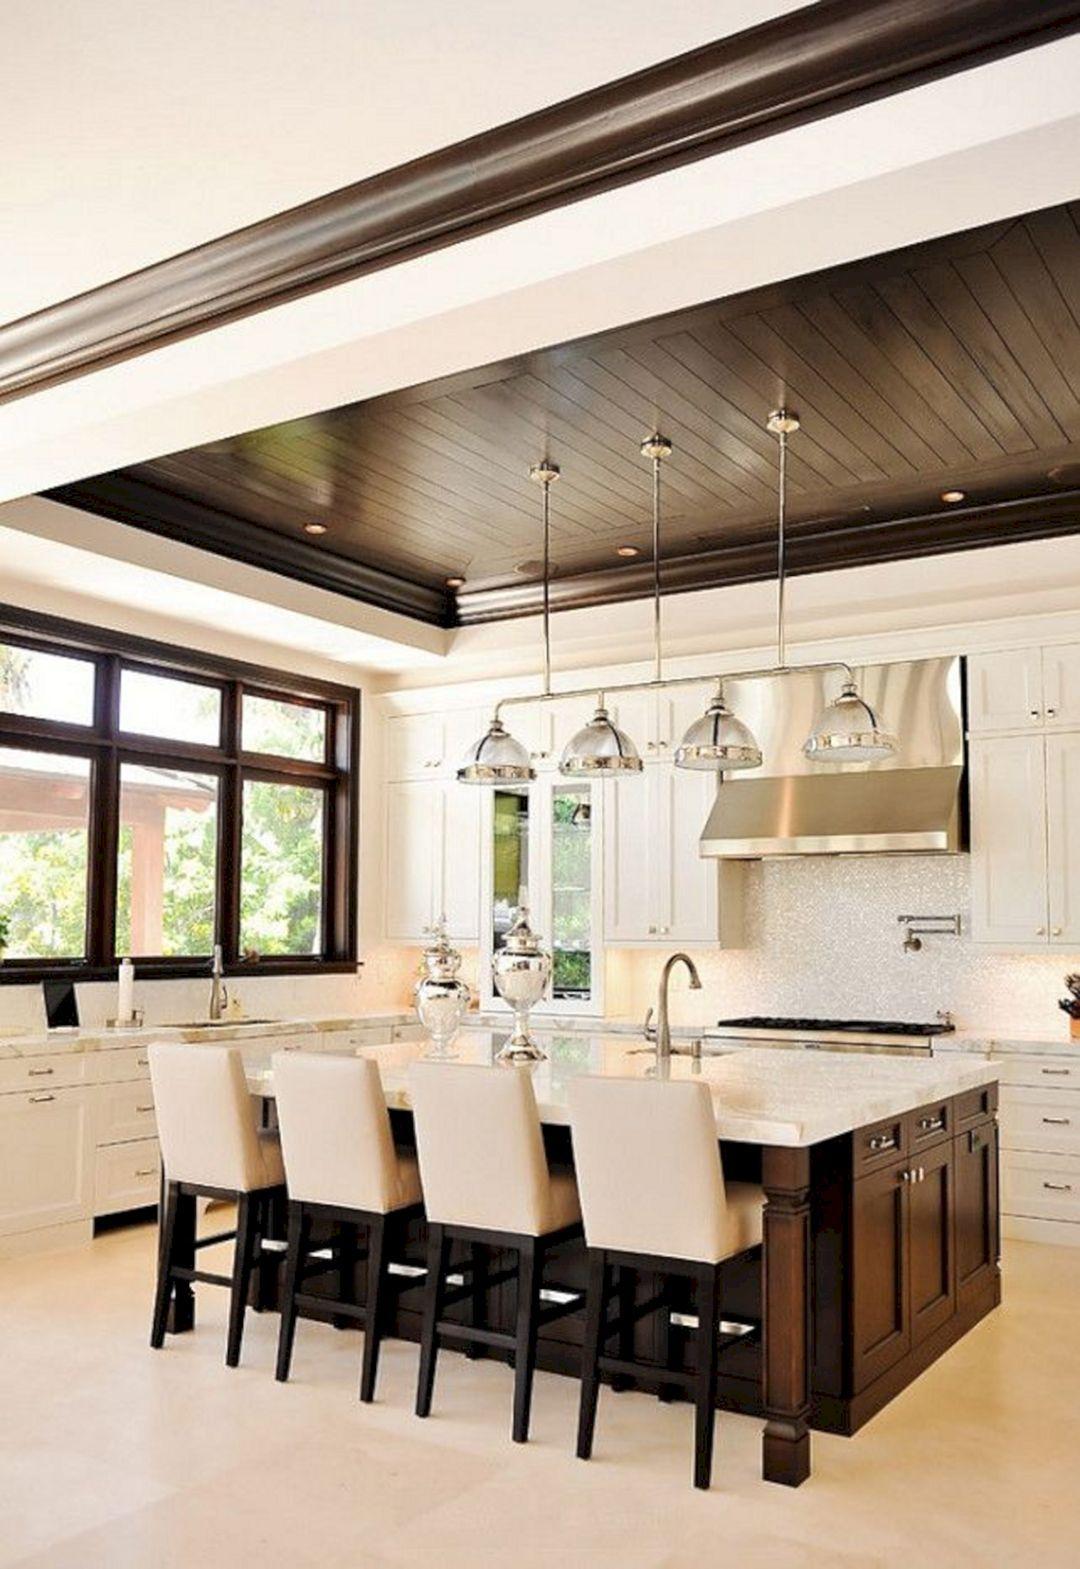 Phenomenal 9 Modern Kitchen Ceiling Design For Amazing Kitchen ...